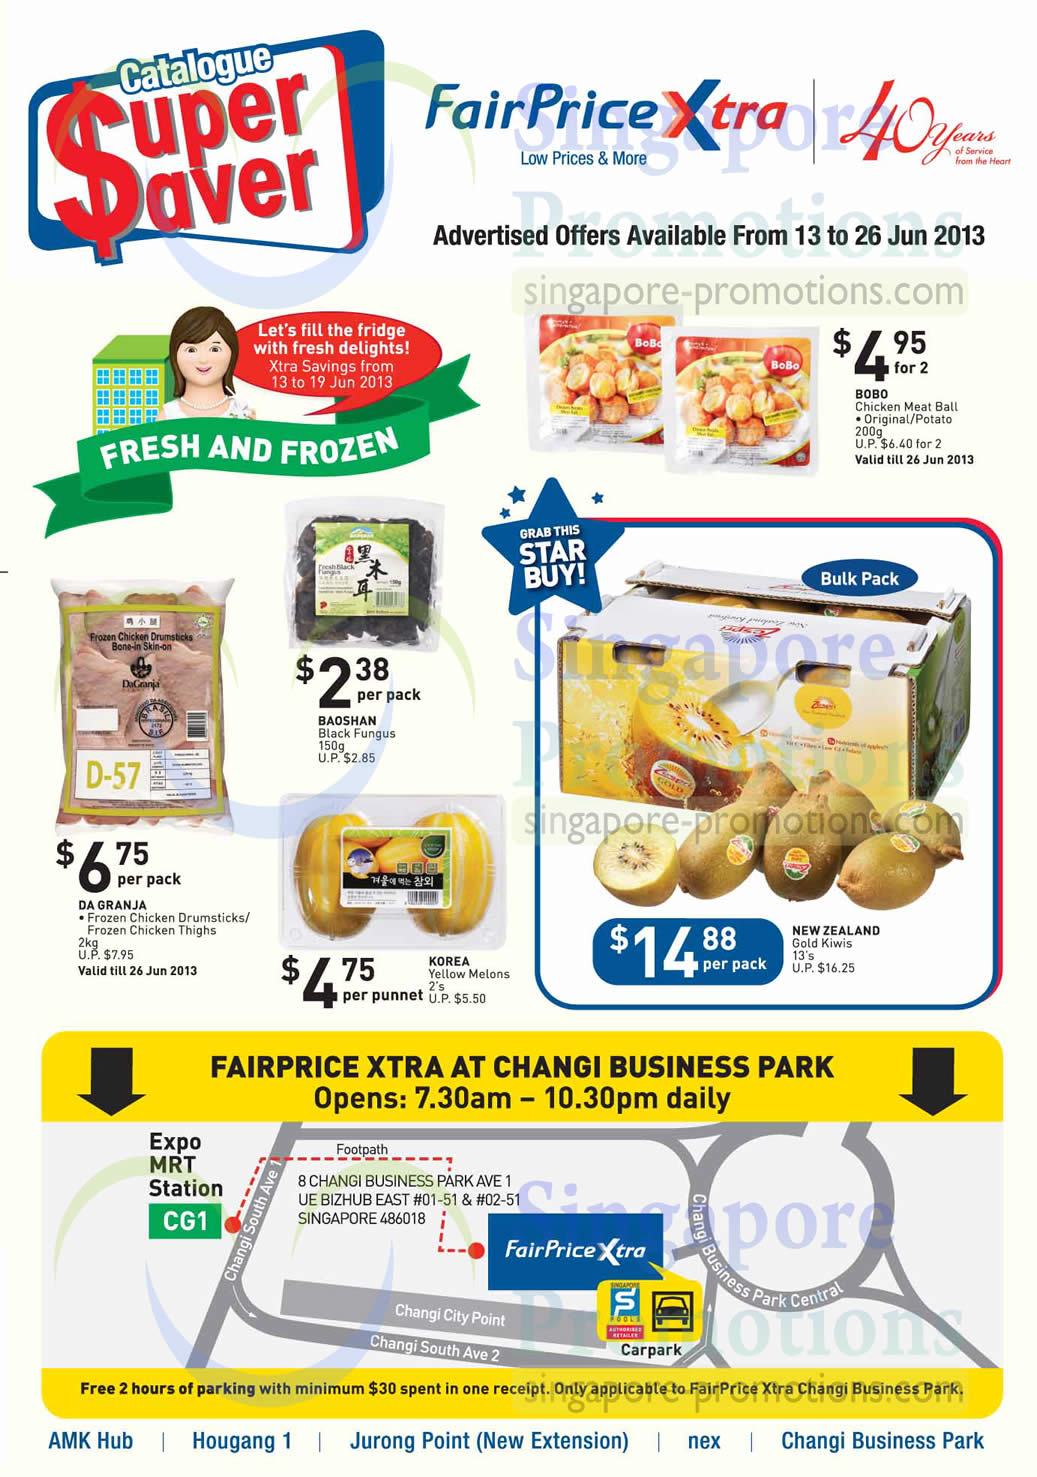 Groceries, Fresh n Frozen, New Zealand Gold Kiwis